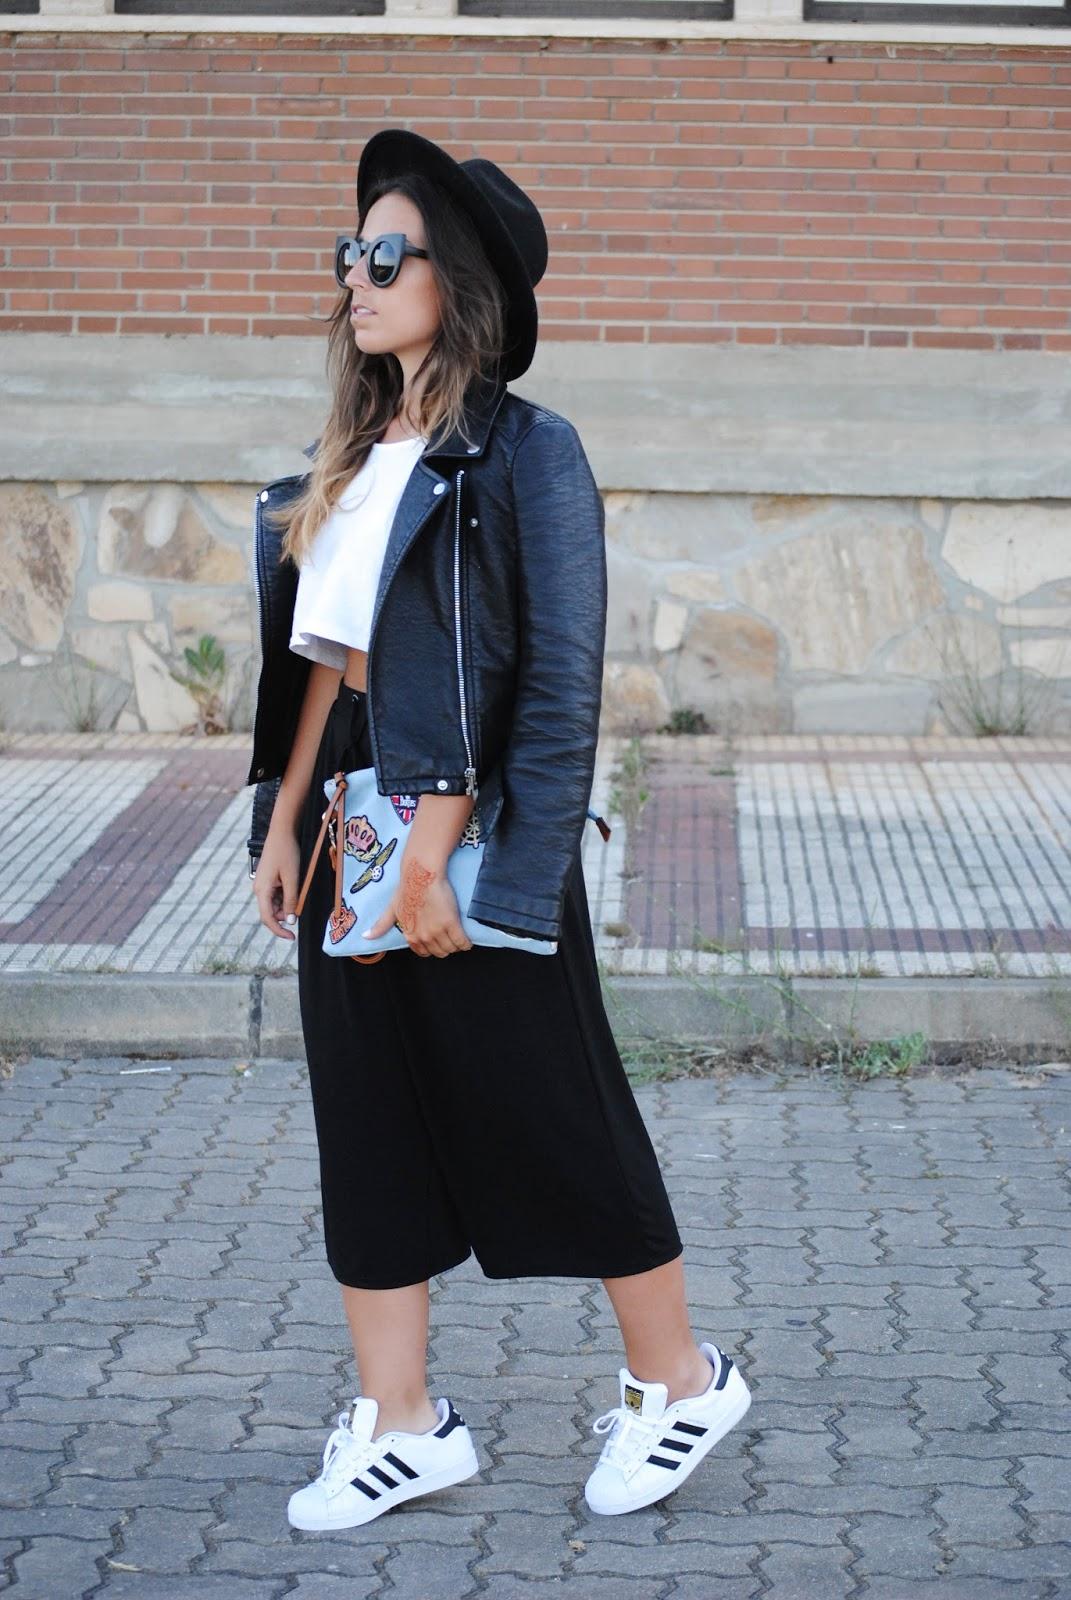 Adidas Superstar Negras Puestas